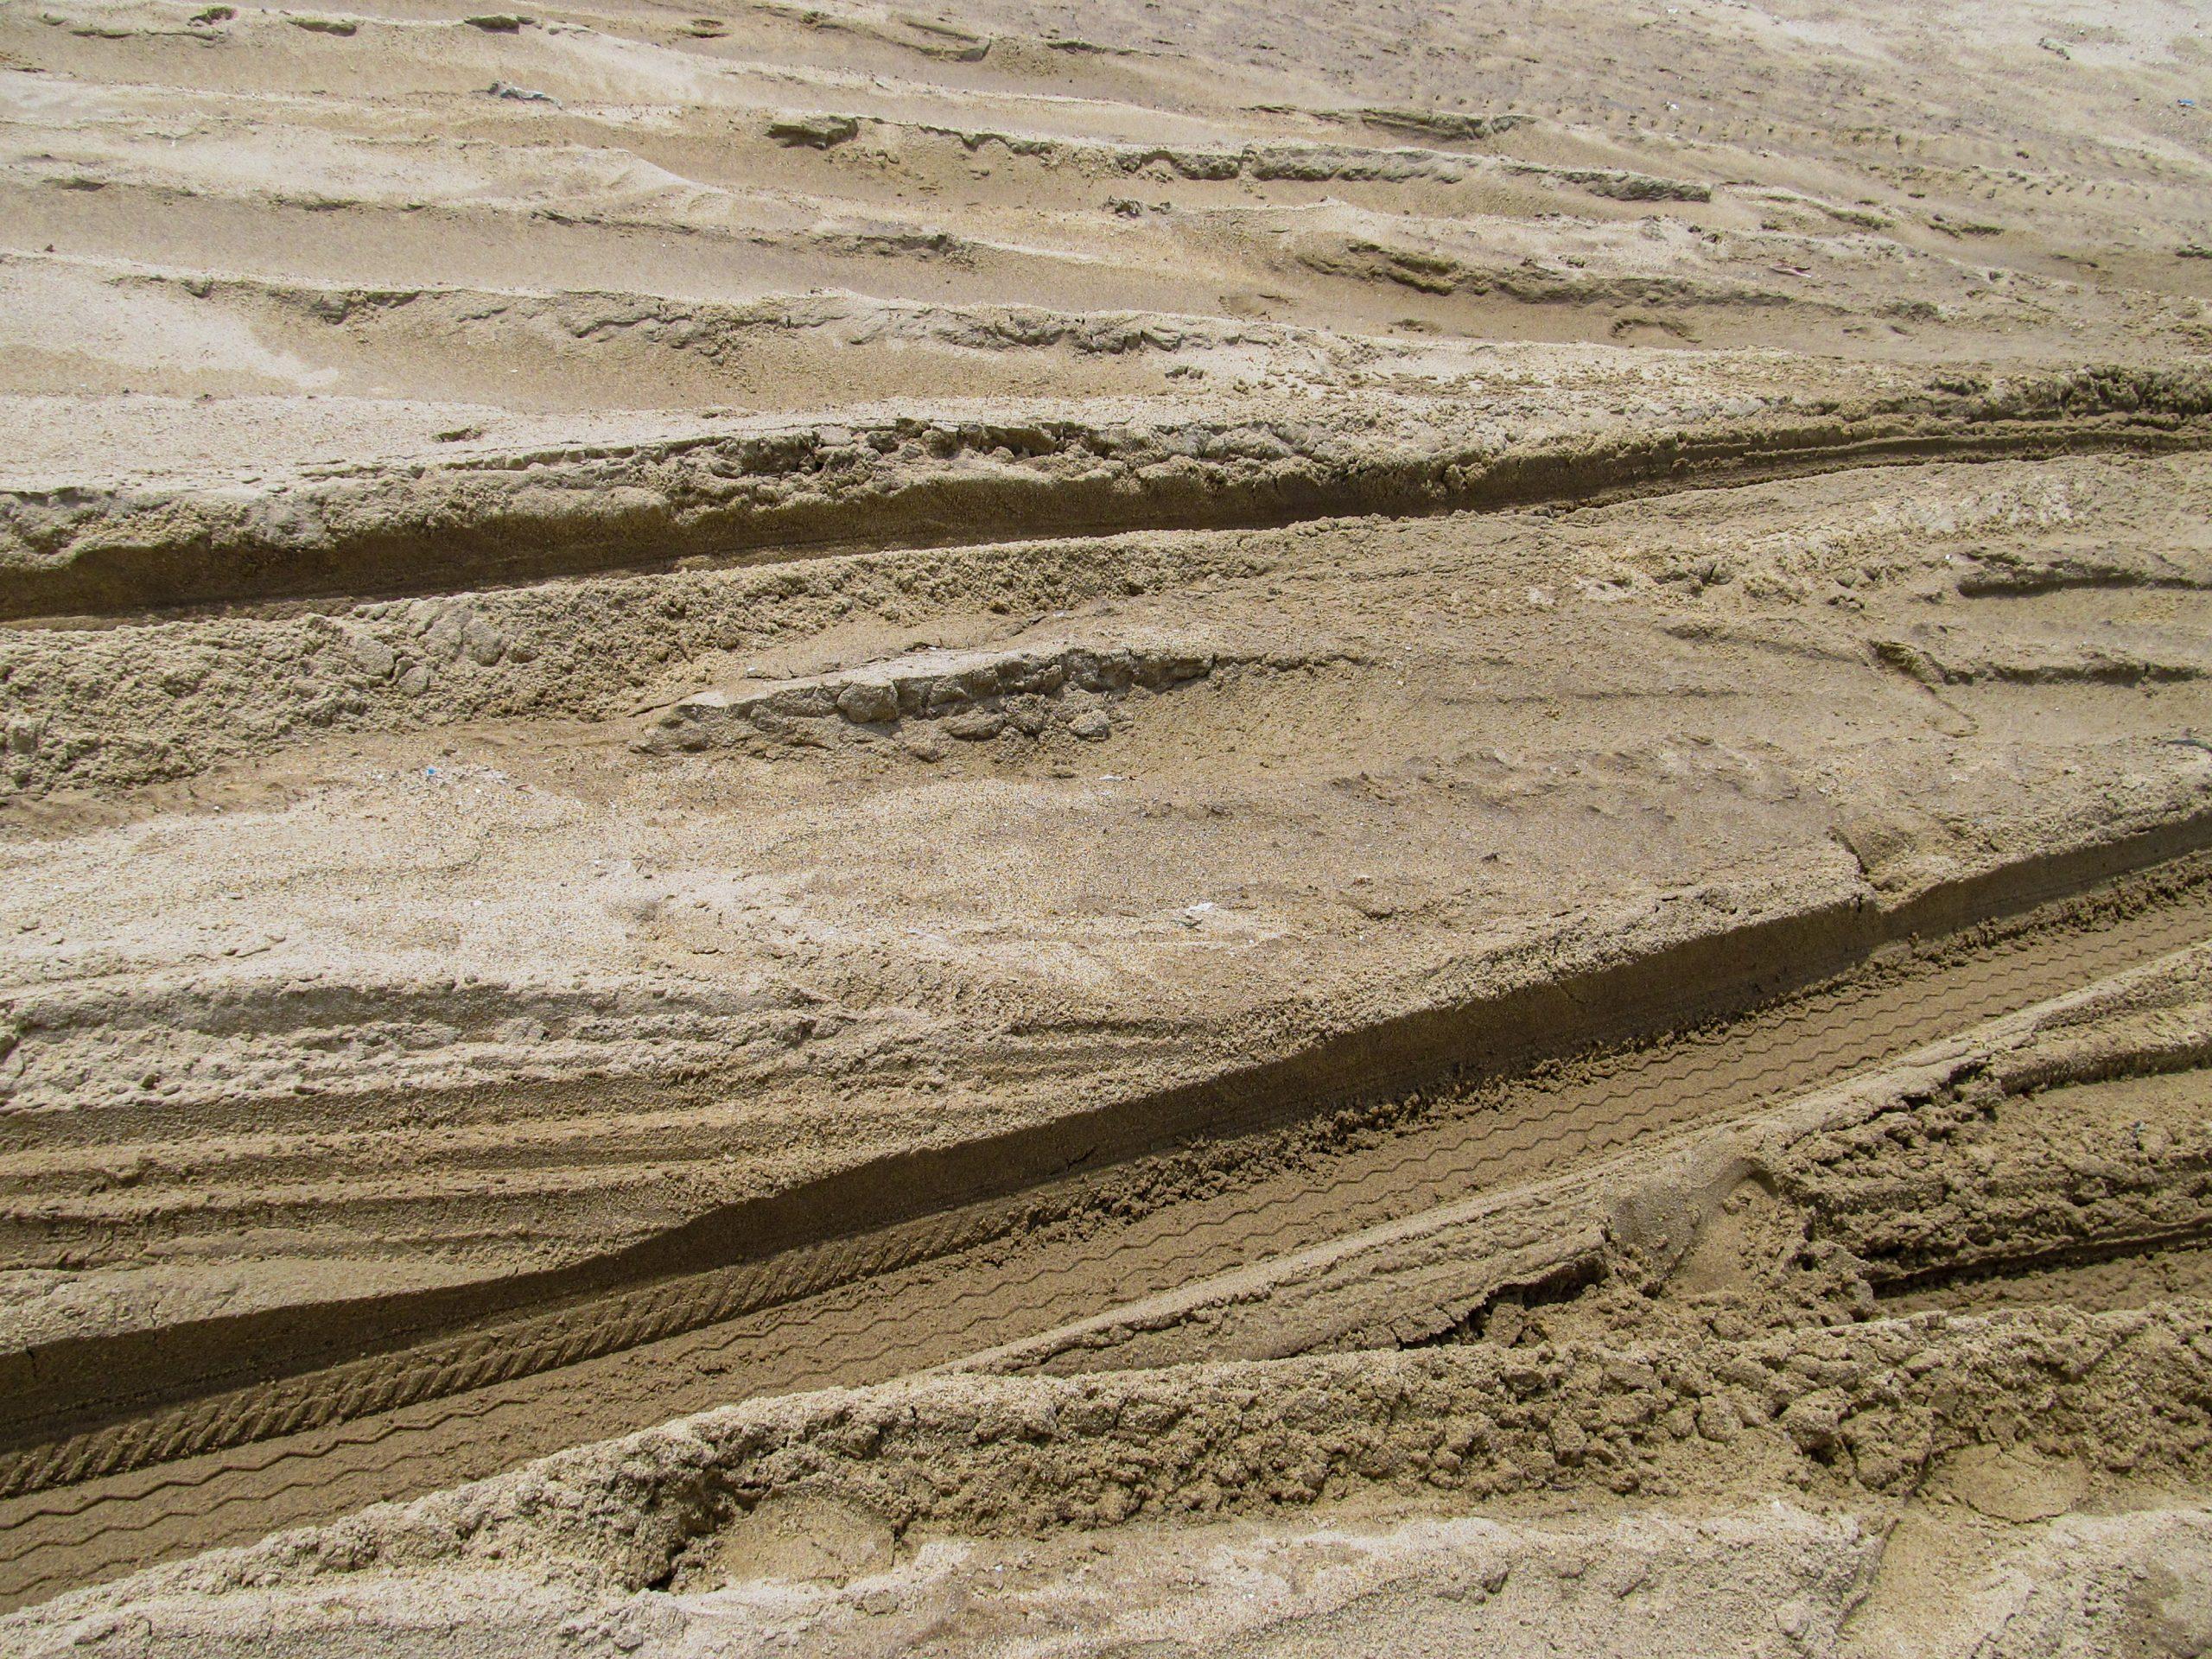 Beach Sand with Tyre Marks